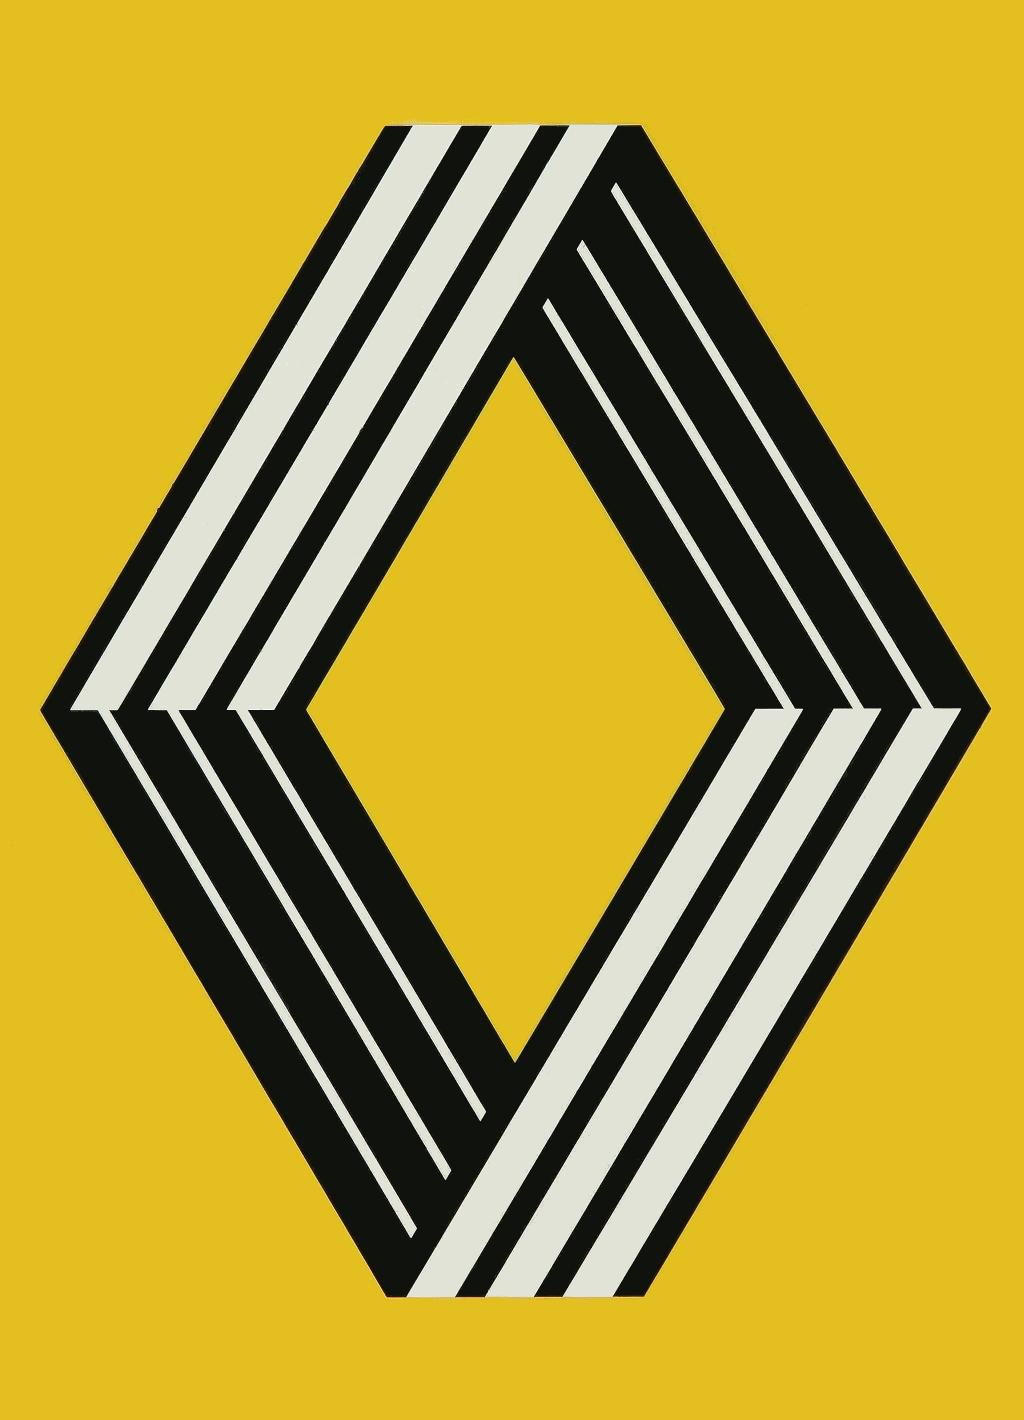 image renault logo 1972png logopedia the logo and